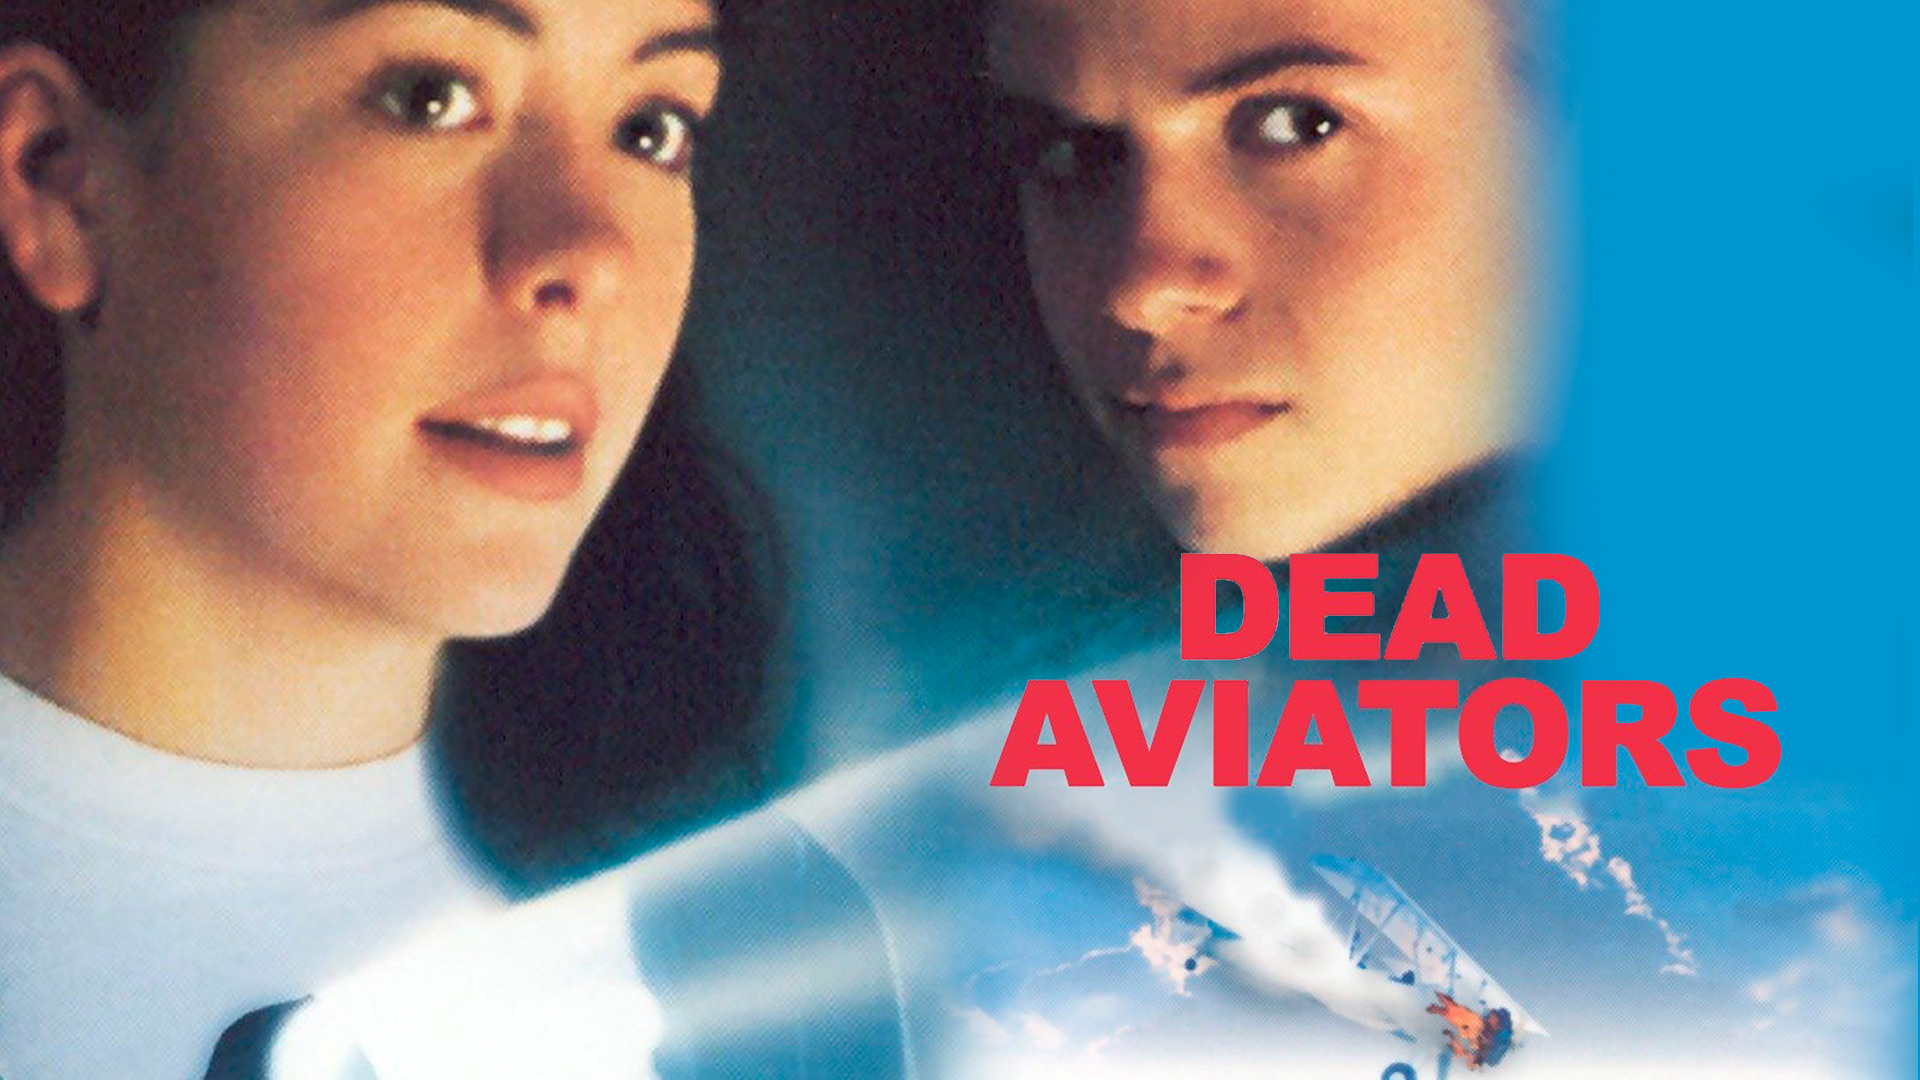 Dead Aviators